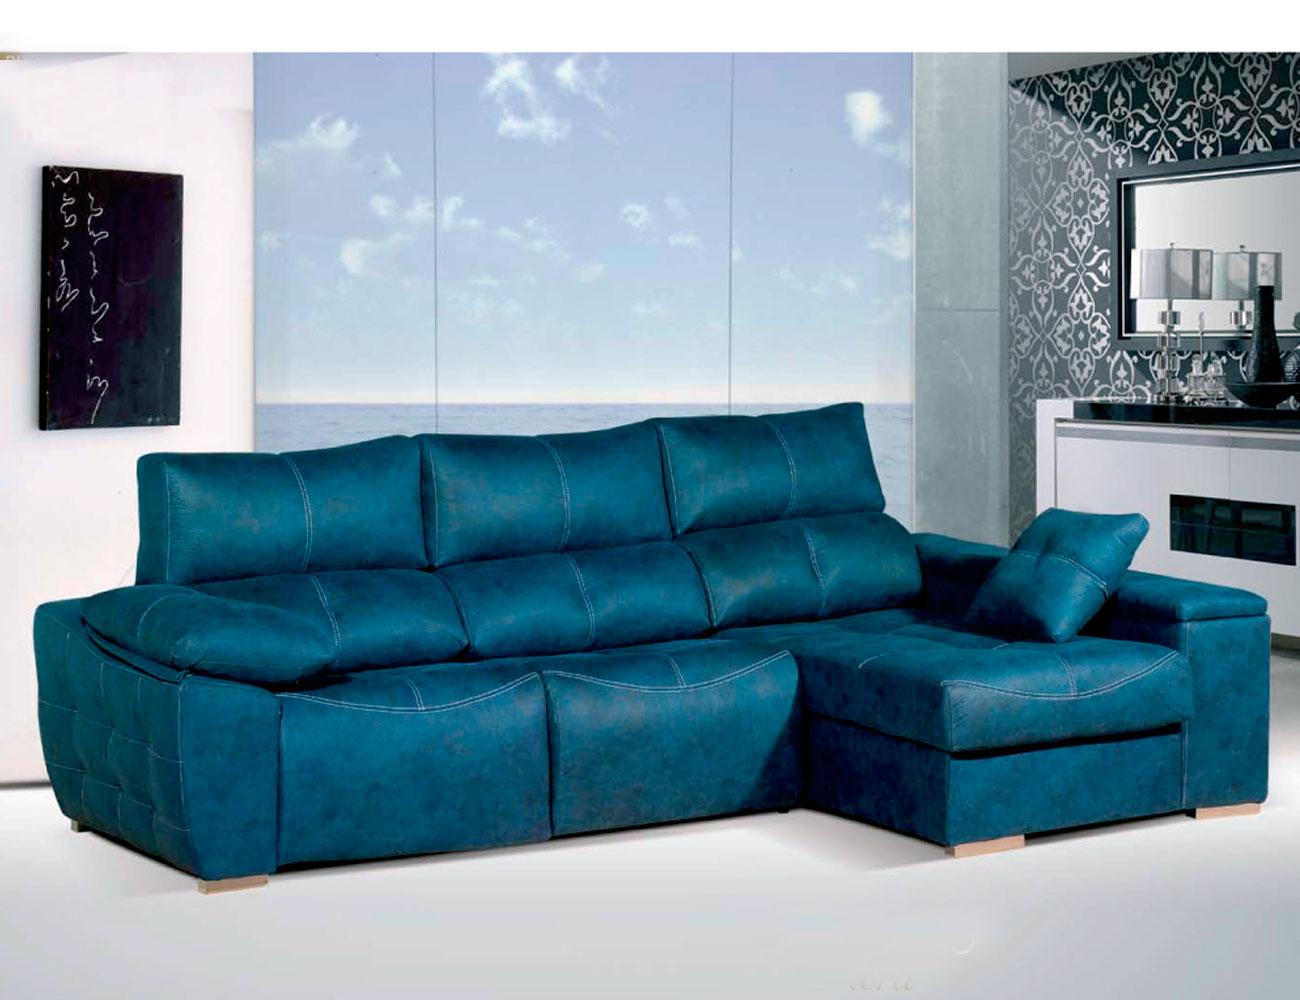 Sofa chaiselongue relax 2 motores anti manchas turquesa33